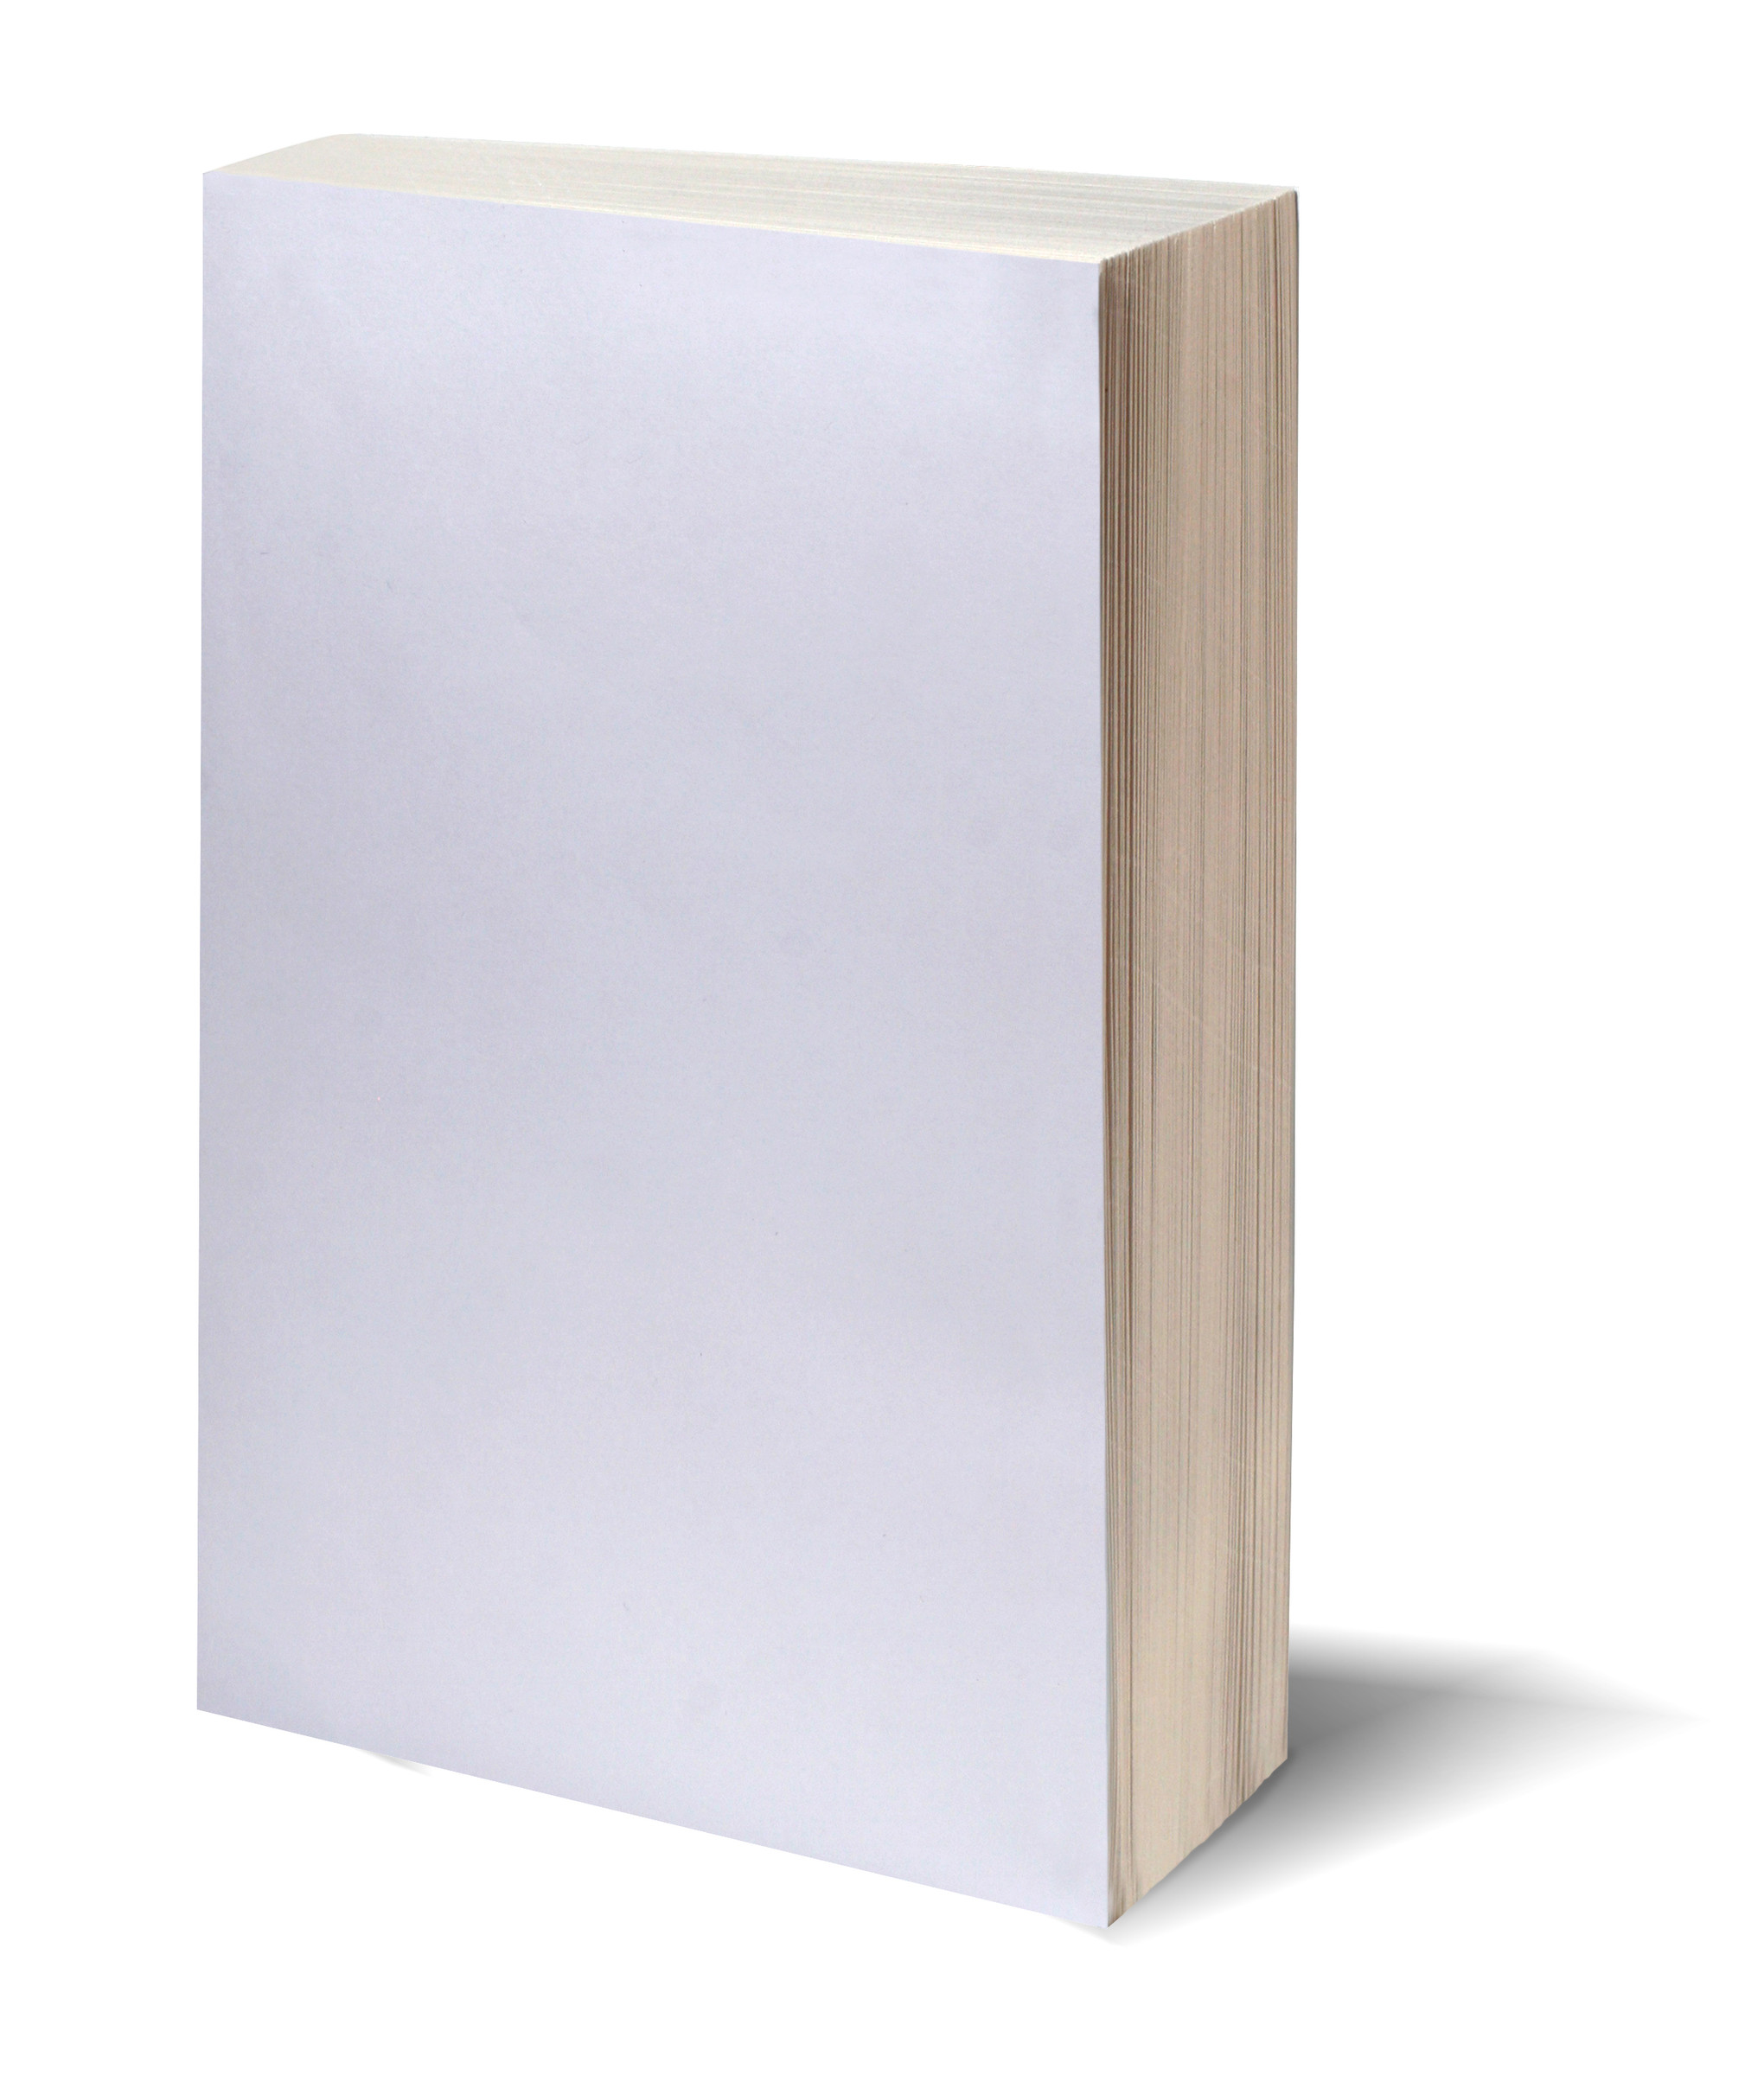 Blank white book w/path | Aishwin Vikhona